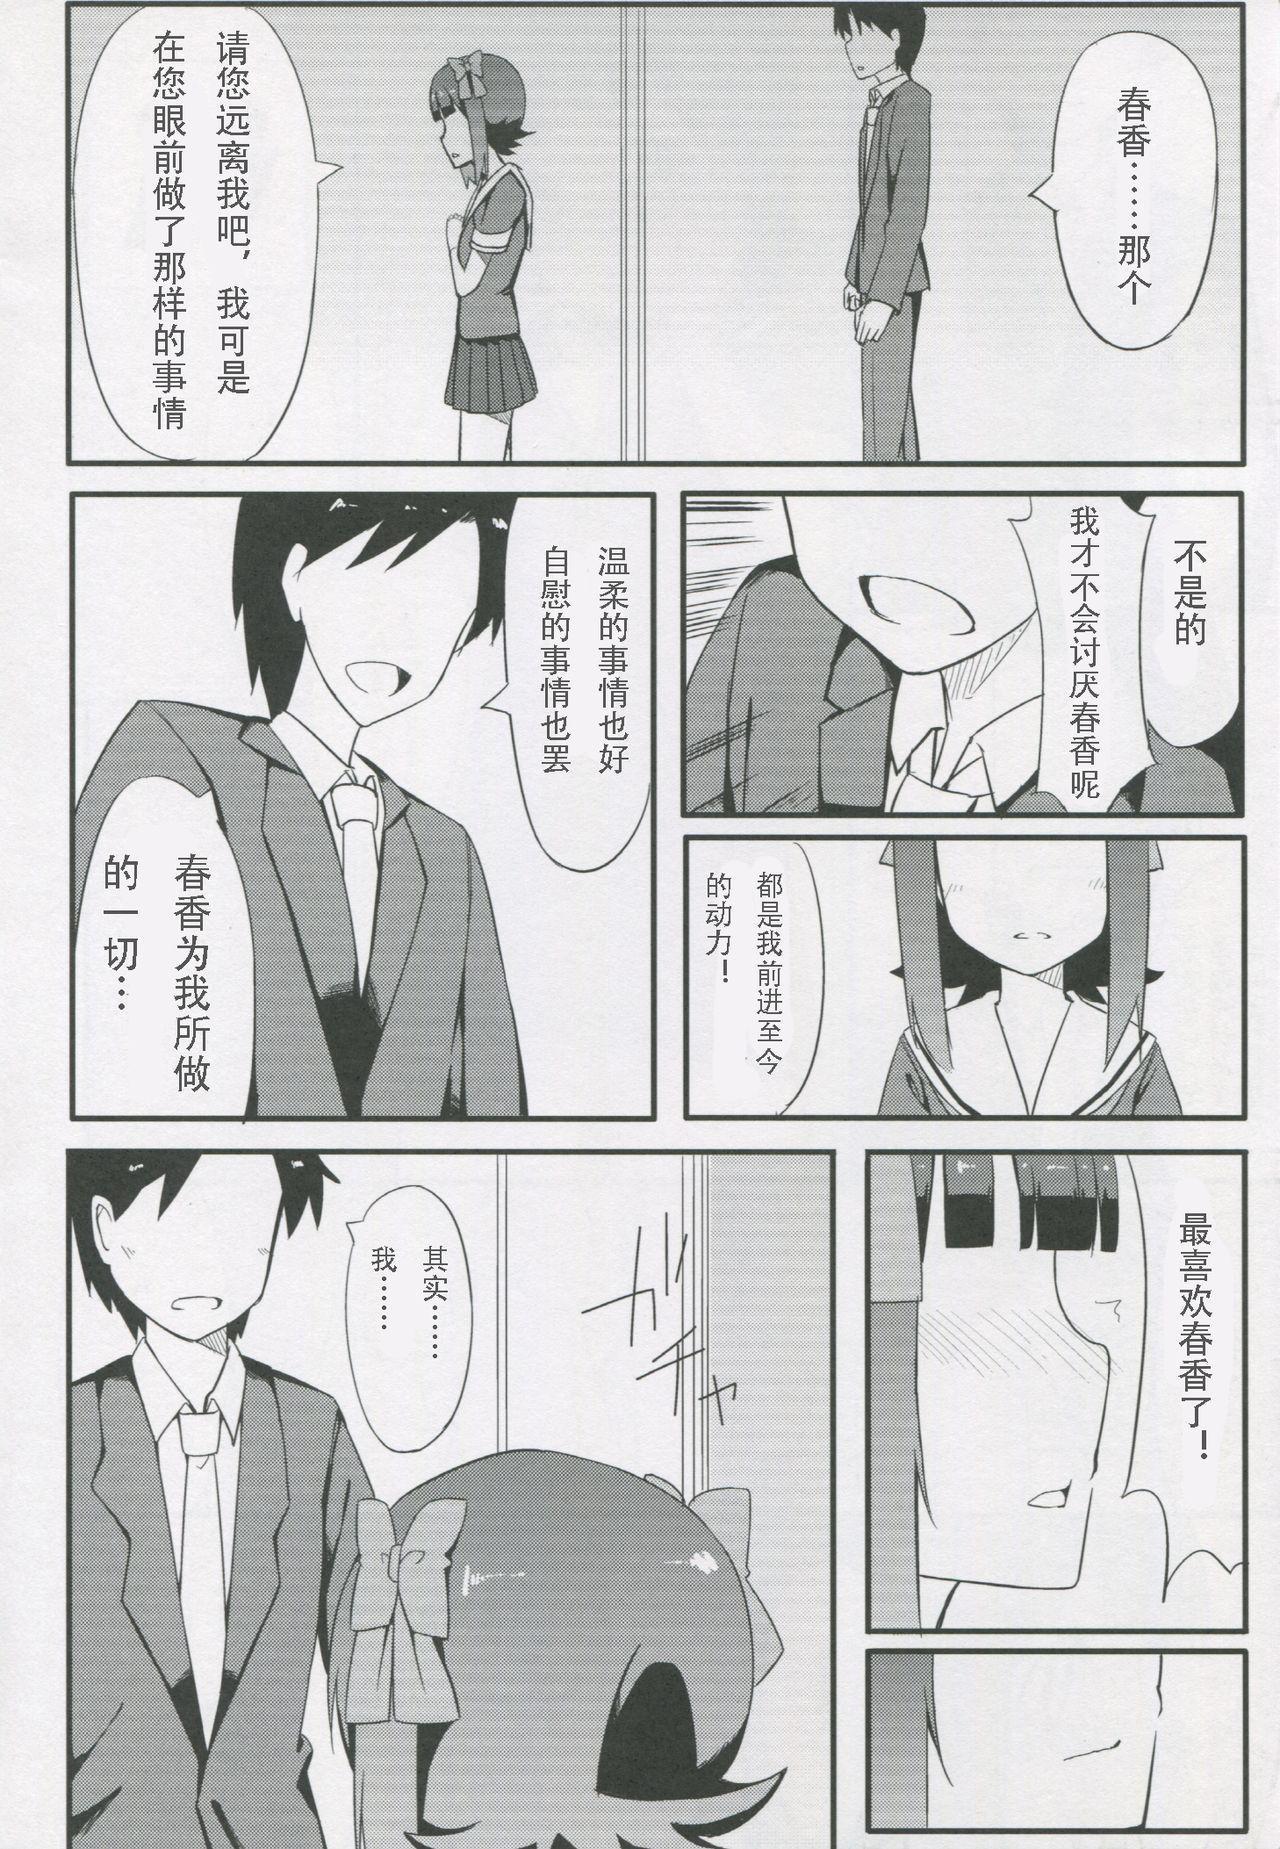 HARUKA COLLECTION 13